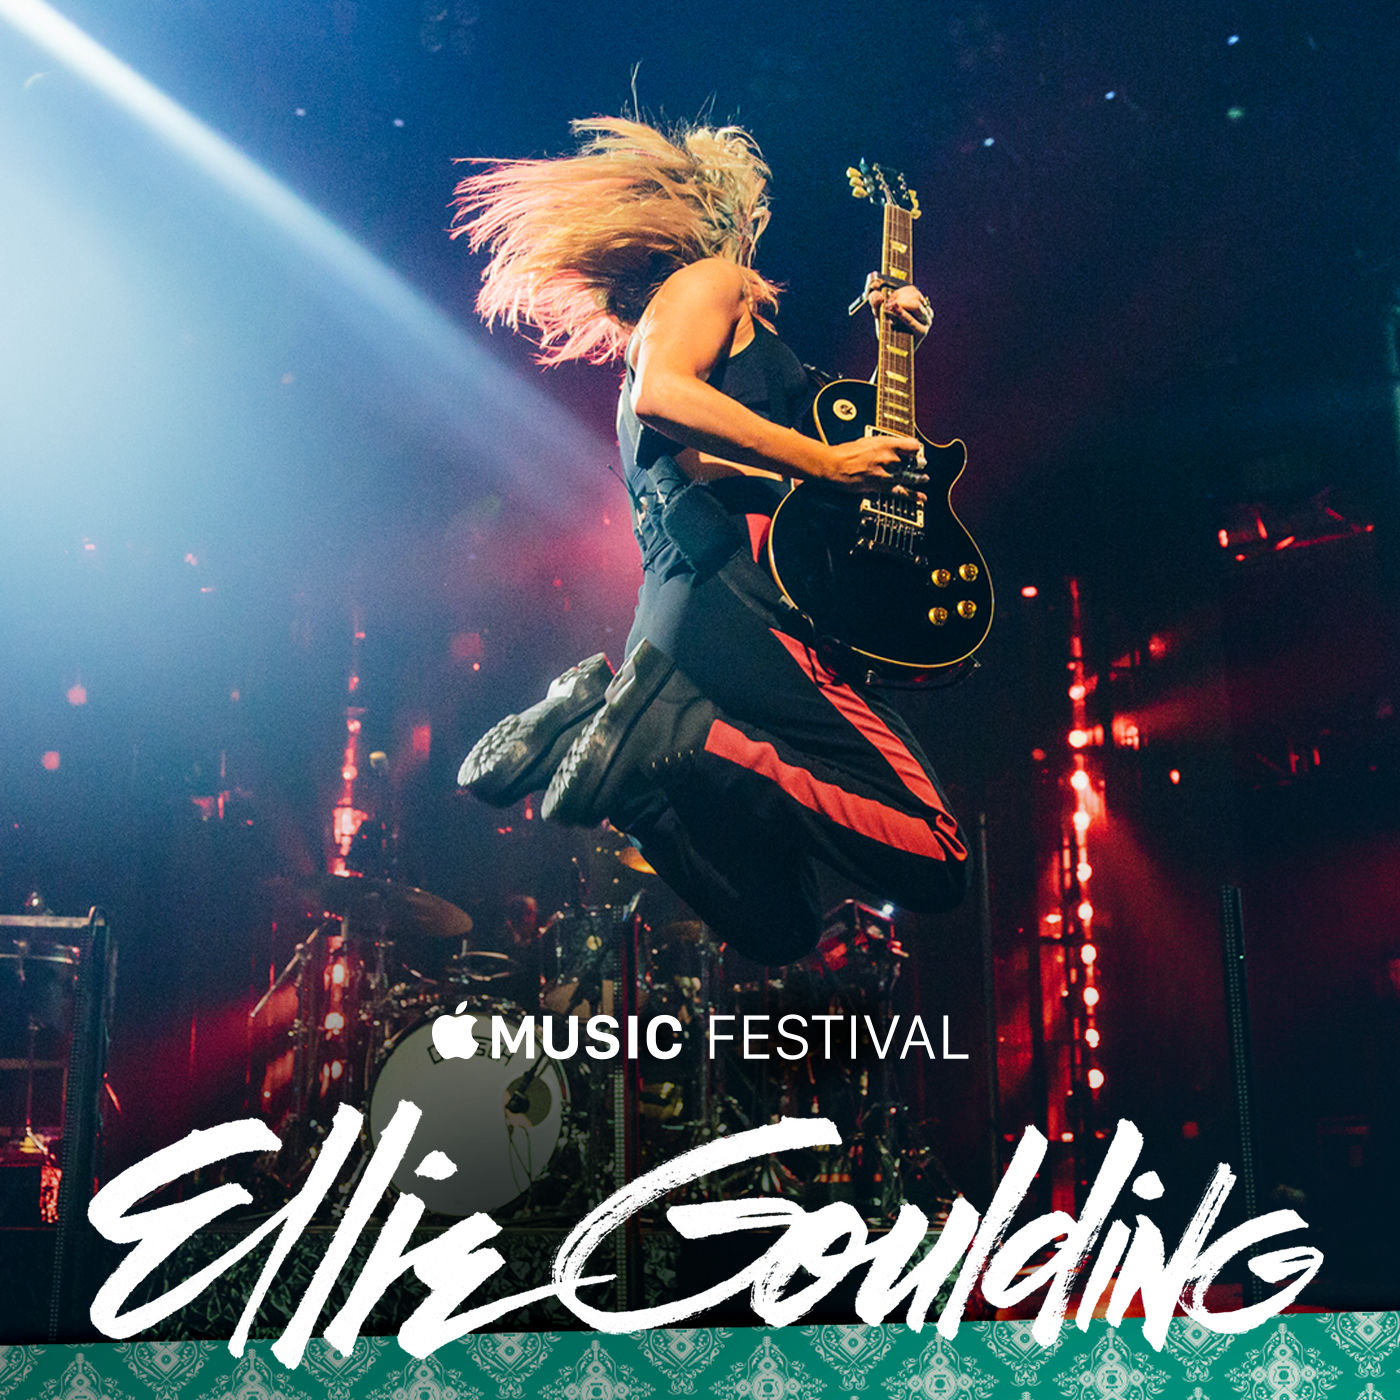 Ellie Goulding – Apple Music Festival London 2015 (Video Album)(iTunes)(2015).m4v